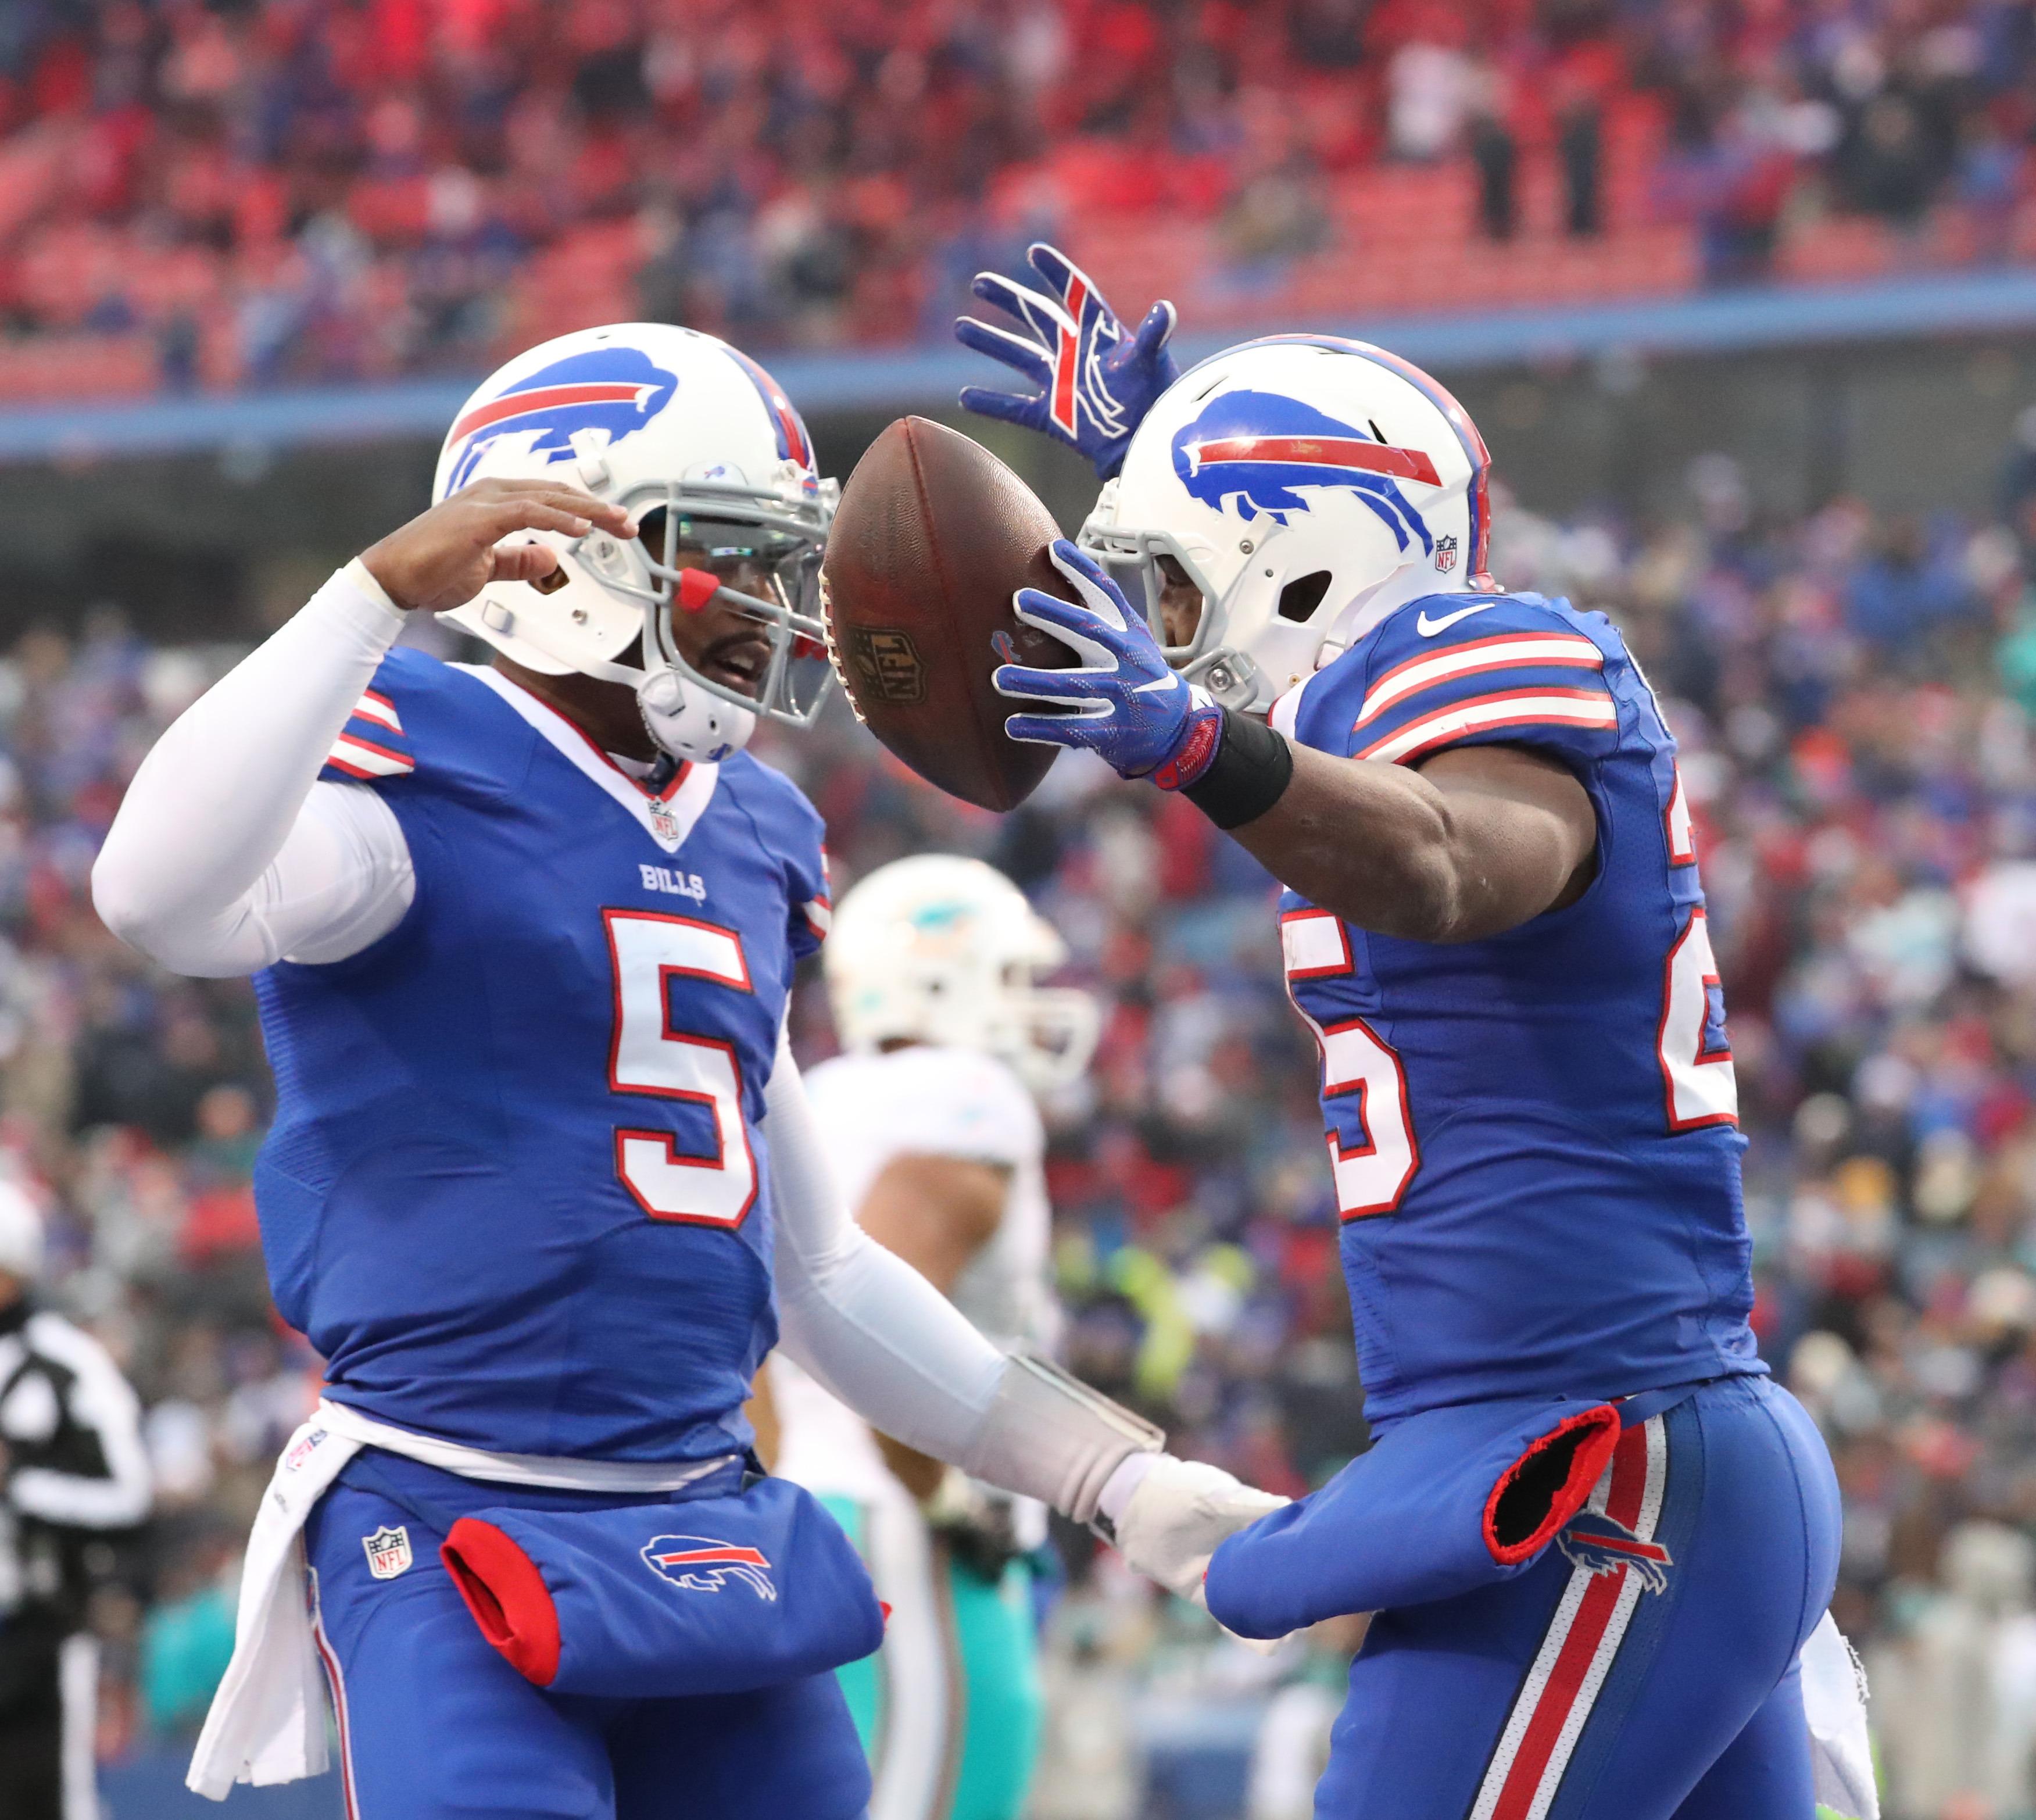 LeSean McCoy (right) celebrates a touchdown with Tyrod Taylor. (James P. McCoy/Buffalo News)